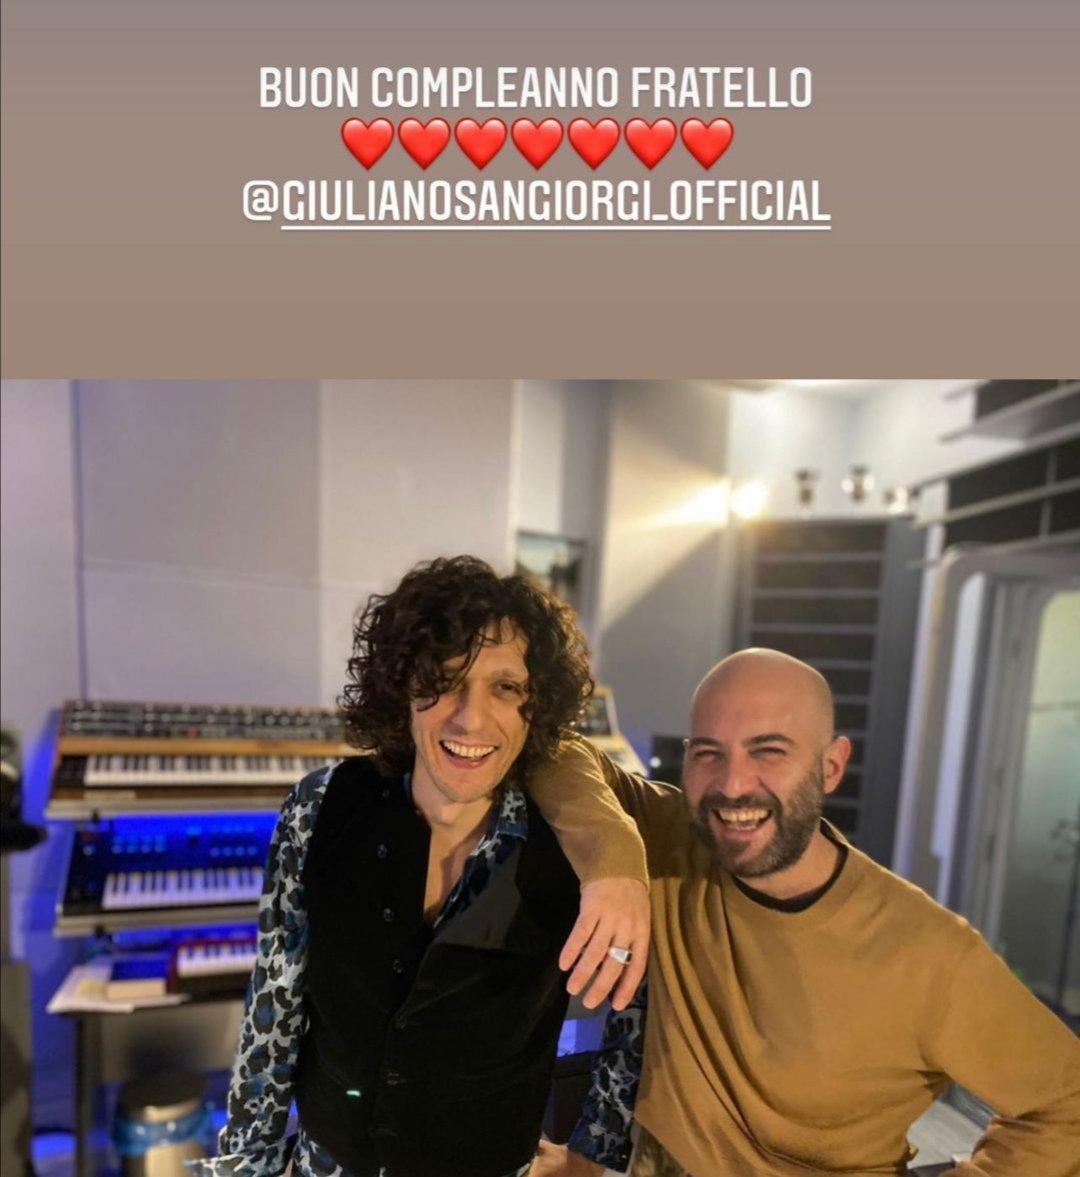 #GiulianoSangiorgi